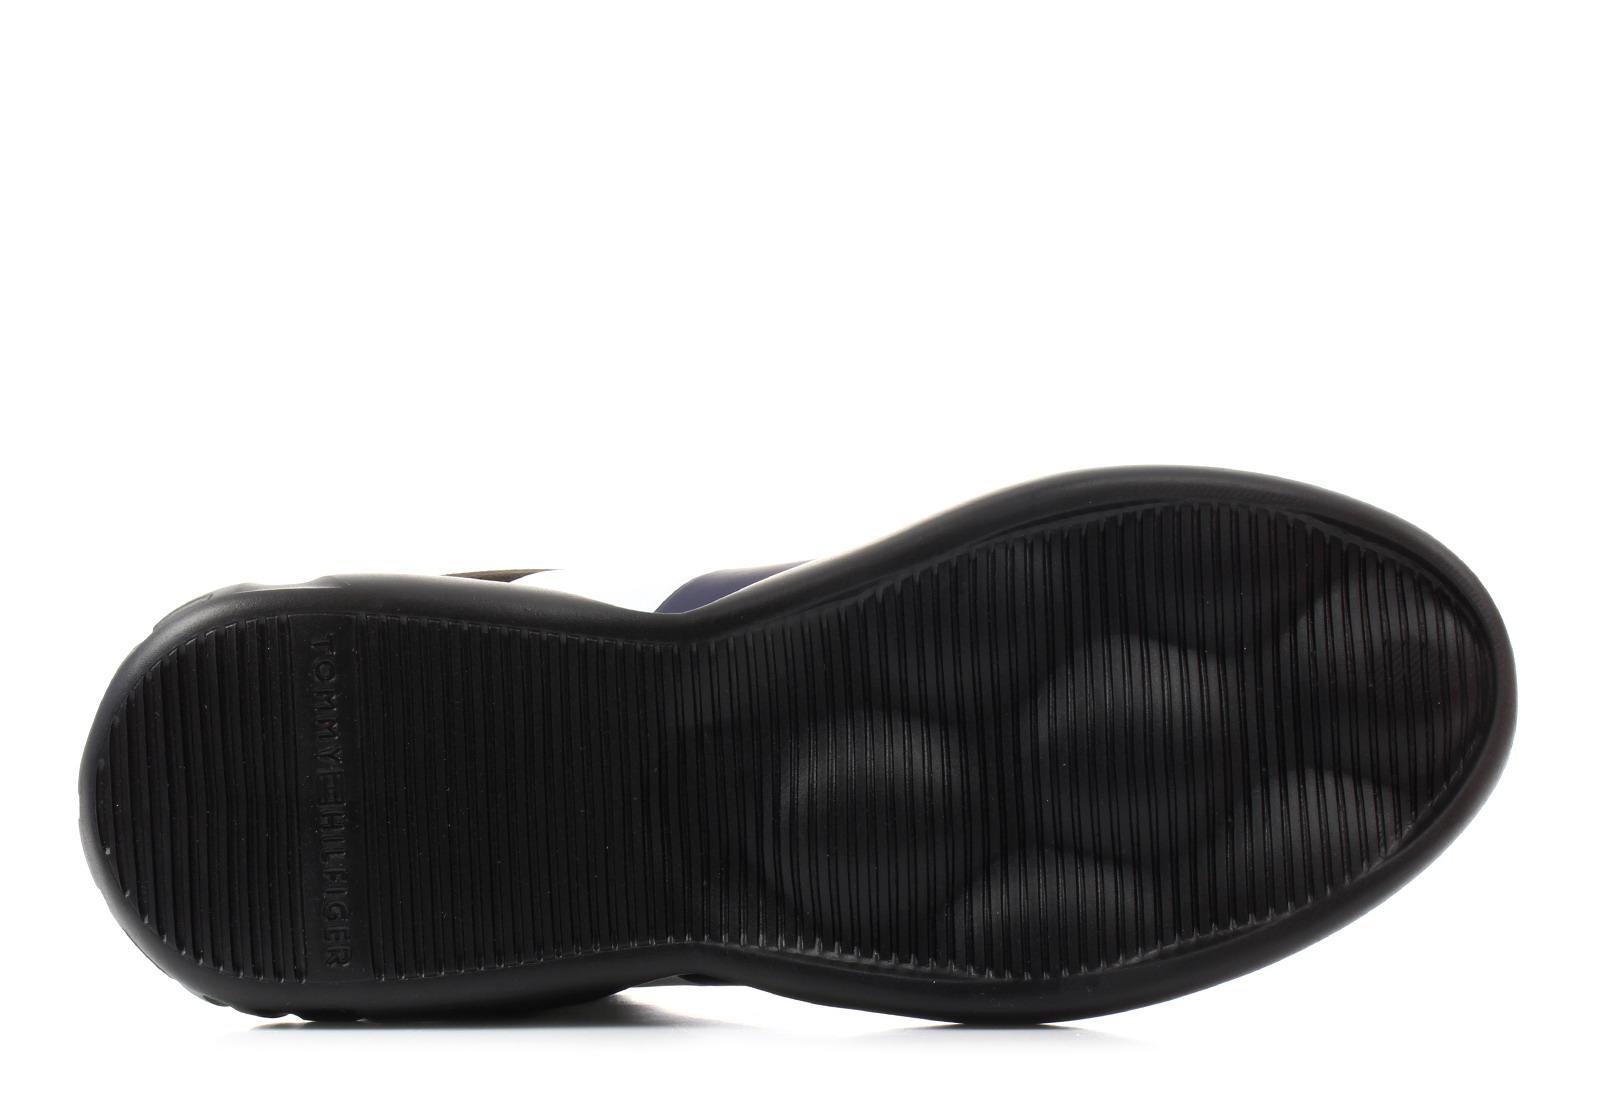 Tommy Hilfiger Cipő - Tate 1c - 18F-1824-990 - Office Shoes Magyarország 1869e6714f